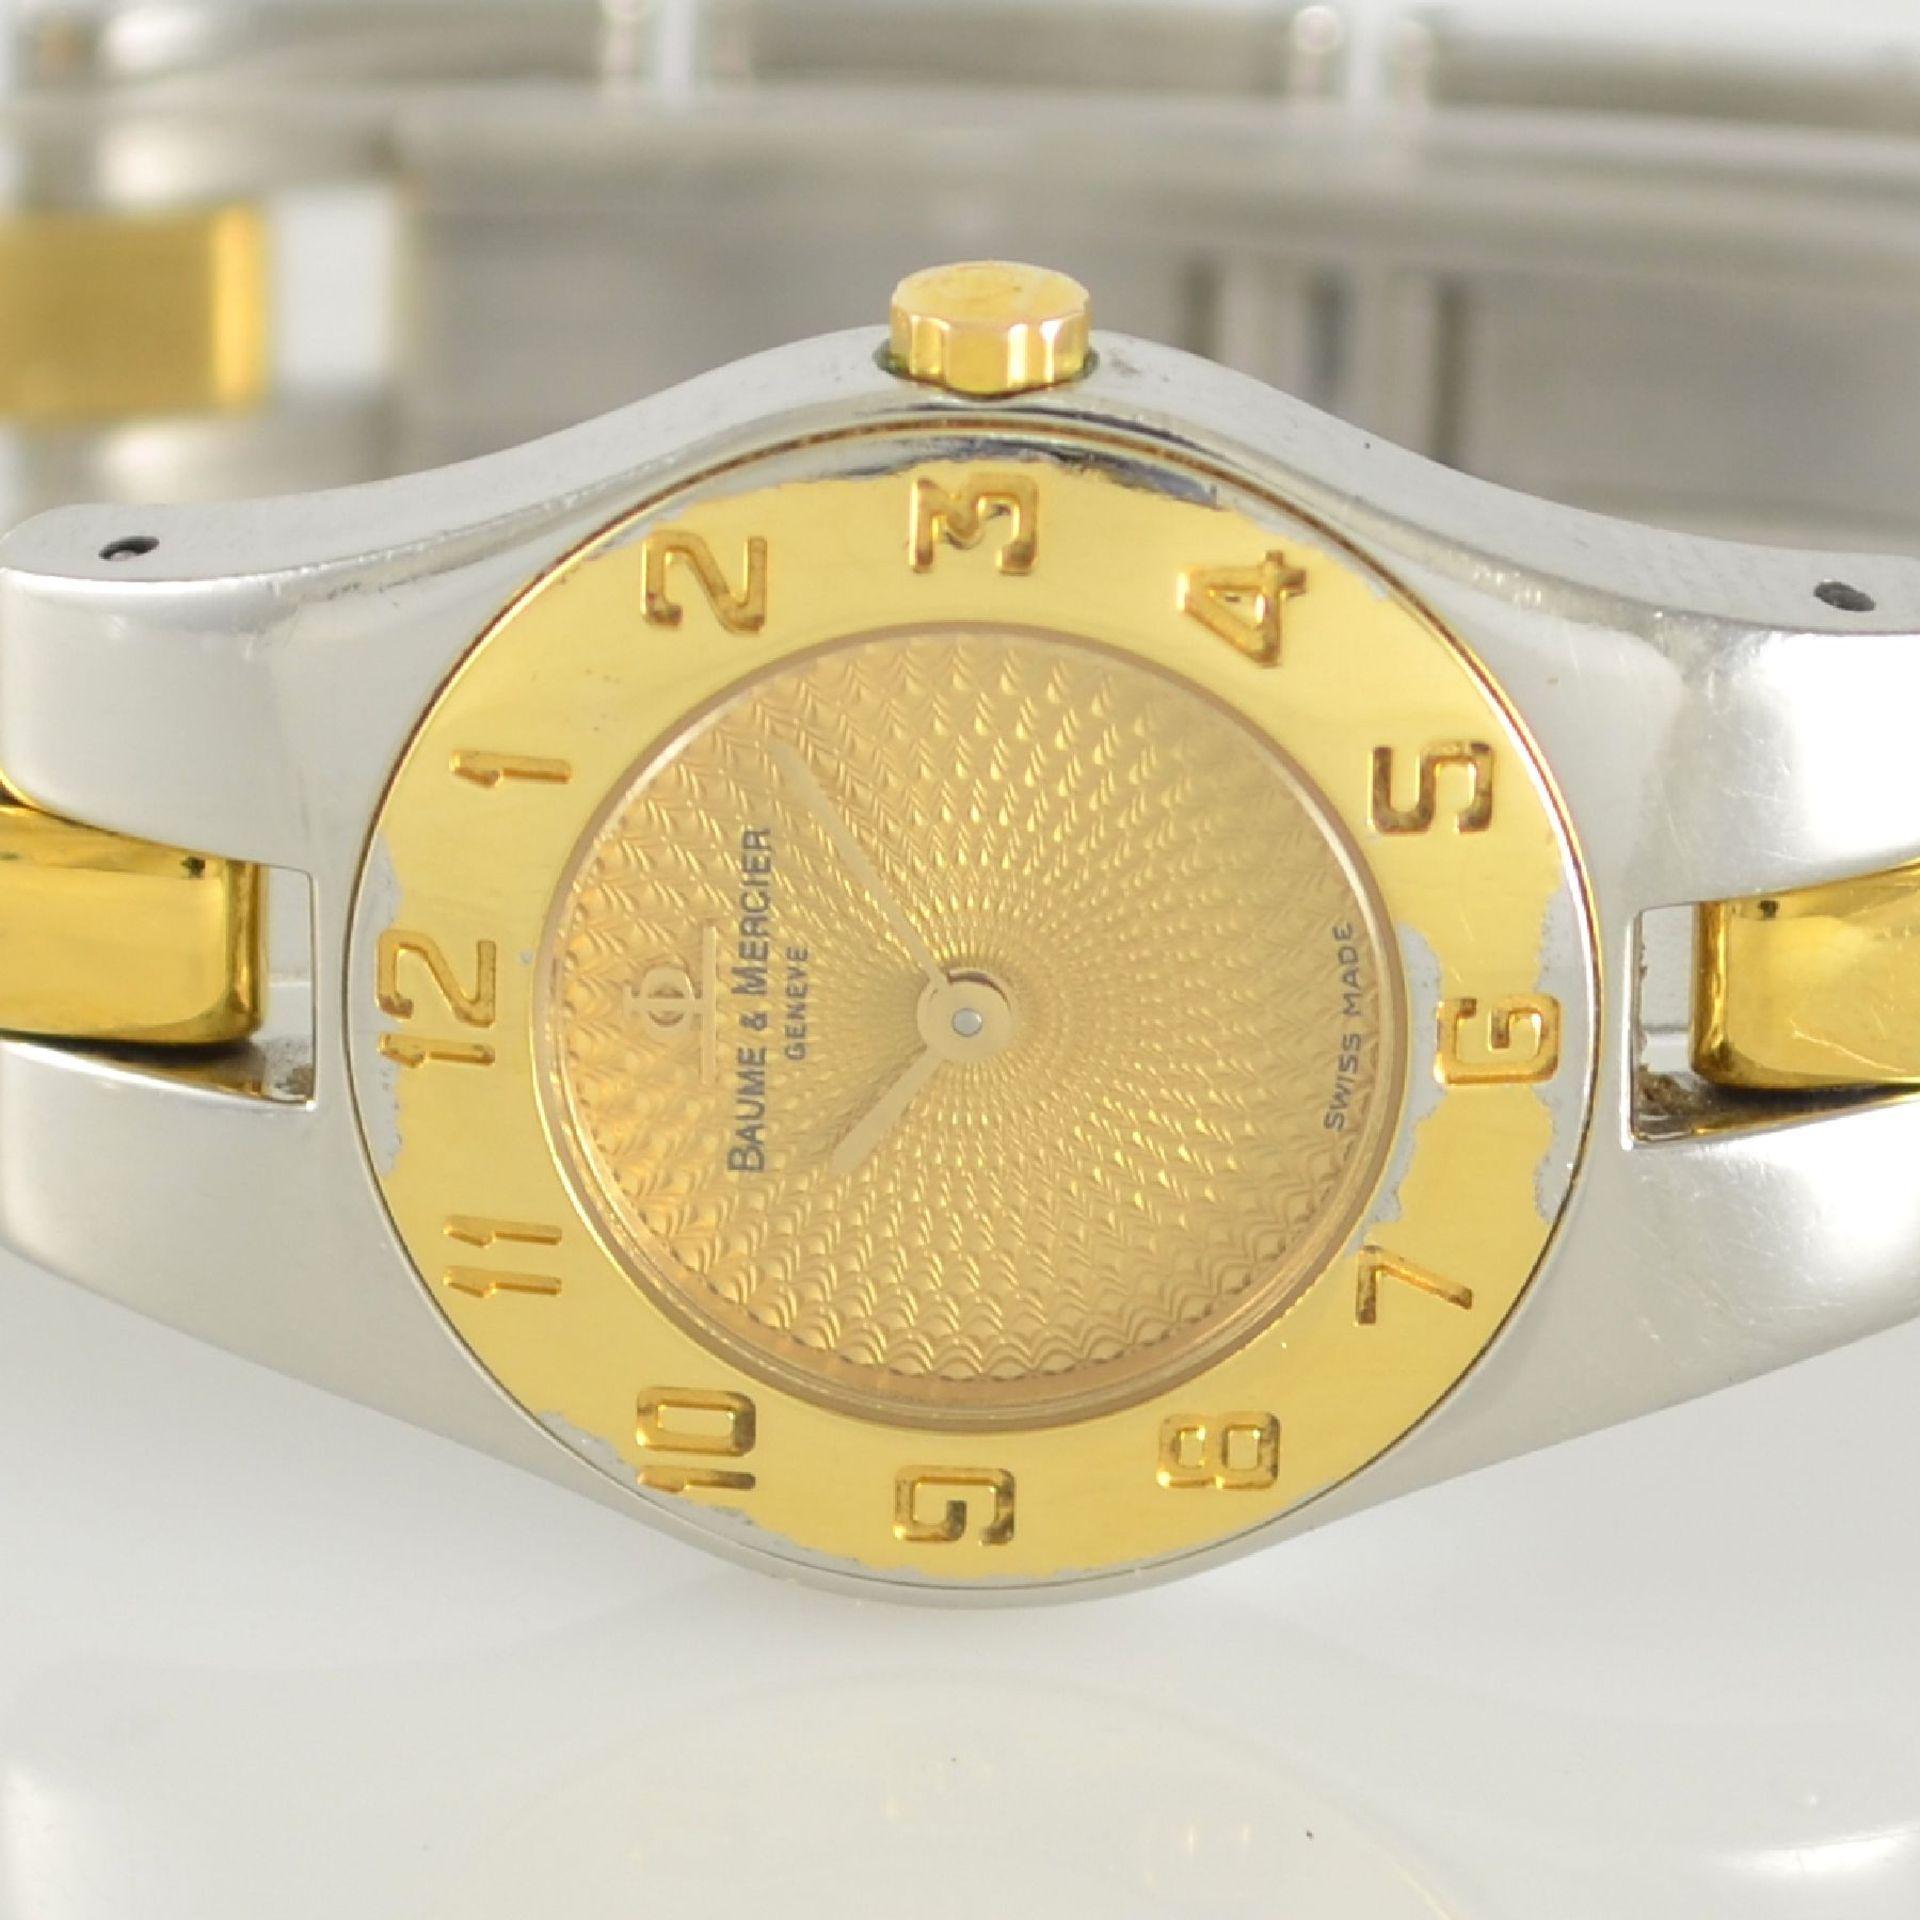 BAUME & MERCIER Damenarmbanduhr in Stahl/ vergoldet, Schweiz um 2000, gedr. Geh. m. integr. - Bild 2 aus 6